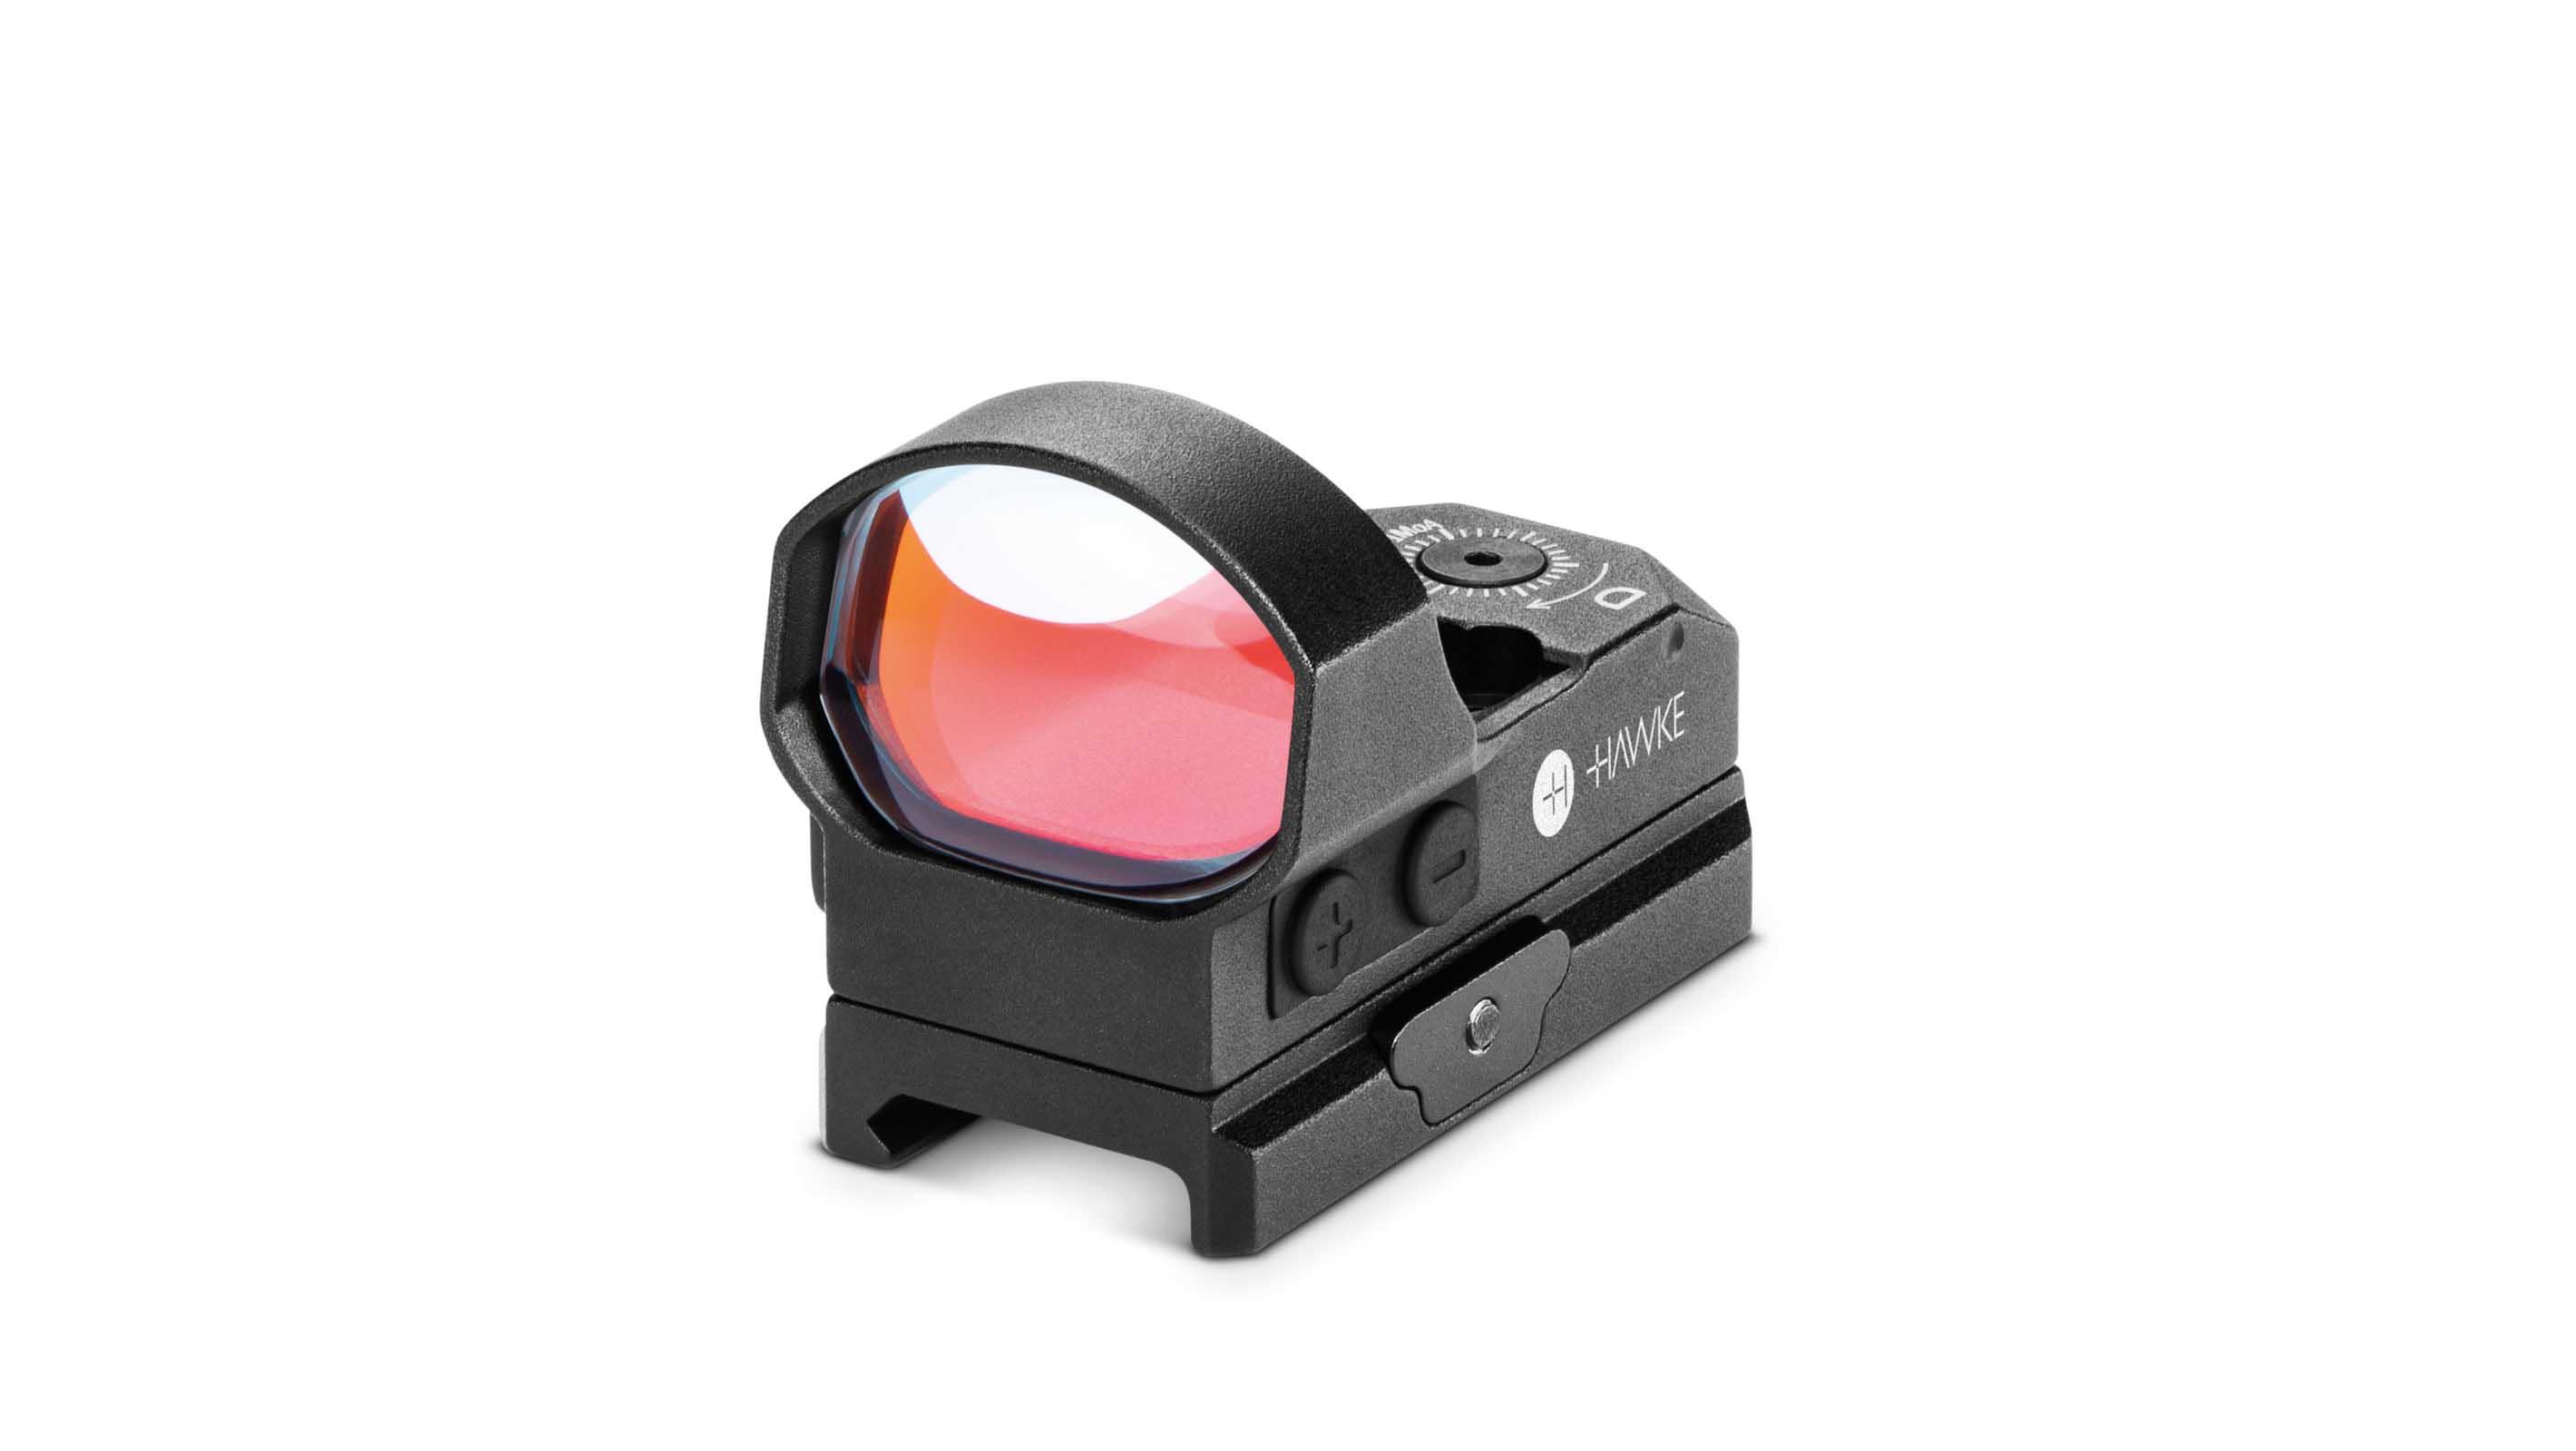 Hawke Red Dot REFLEX SIGHT 'WIDE VIEW'